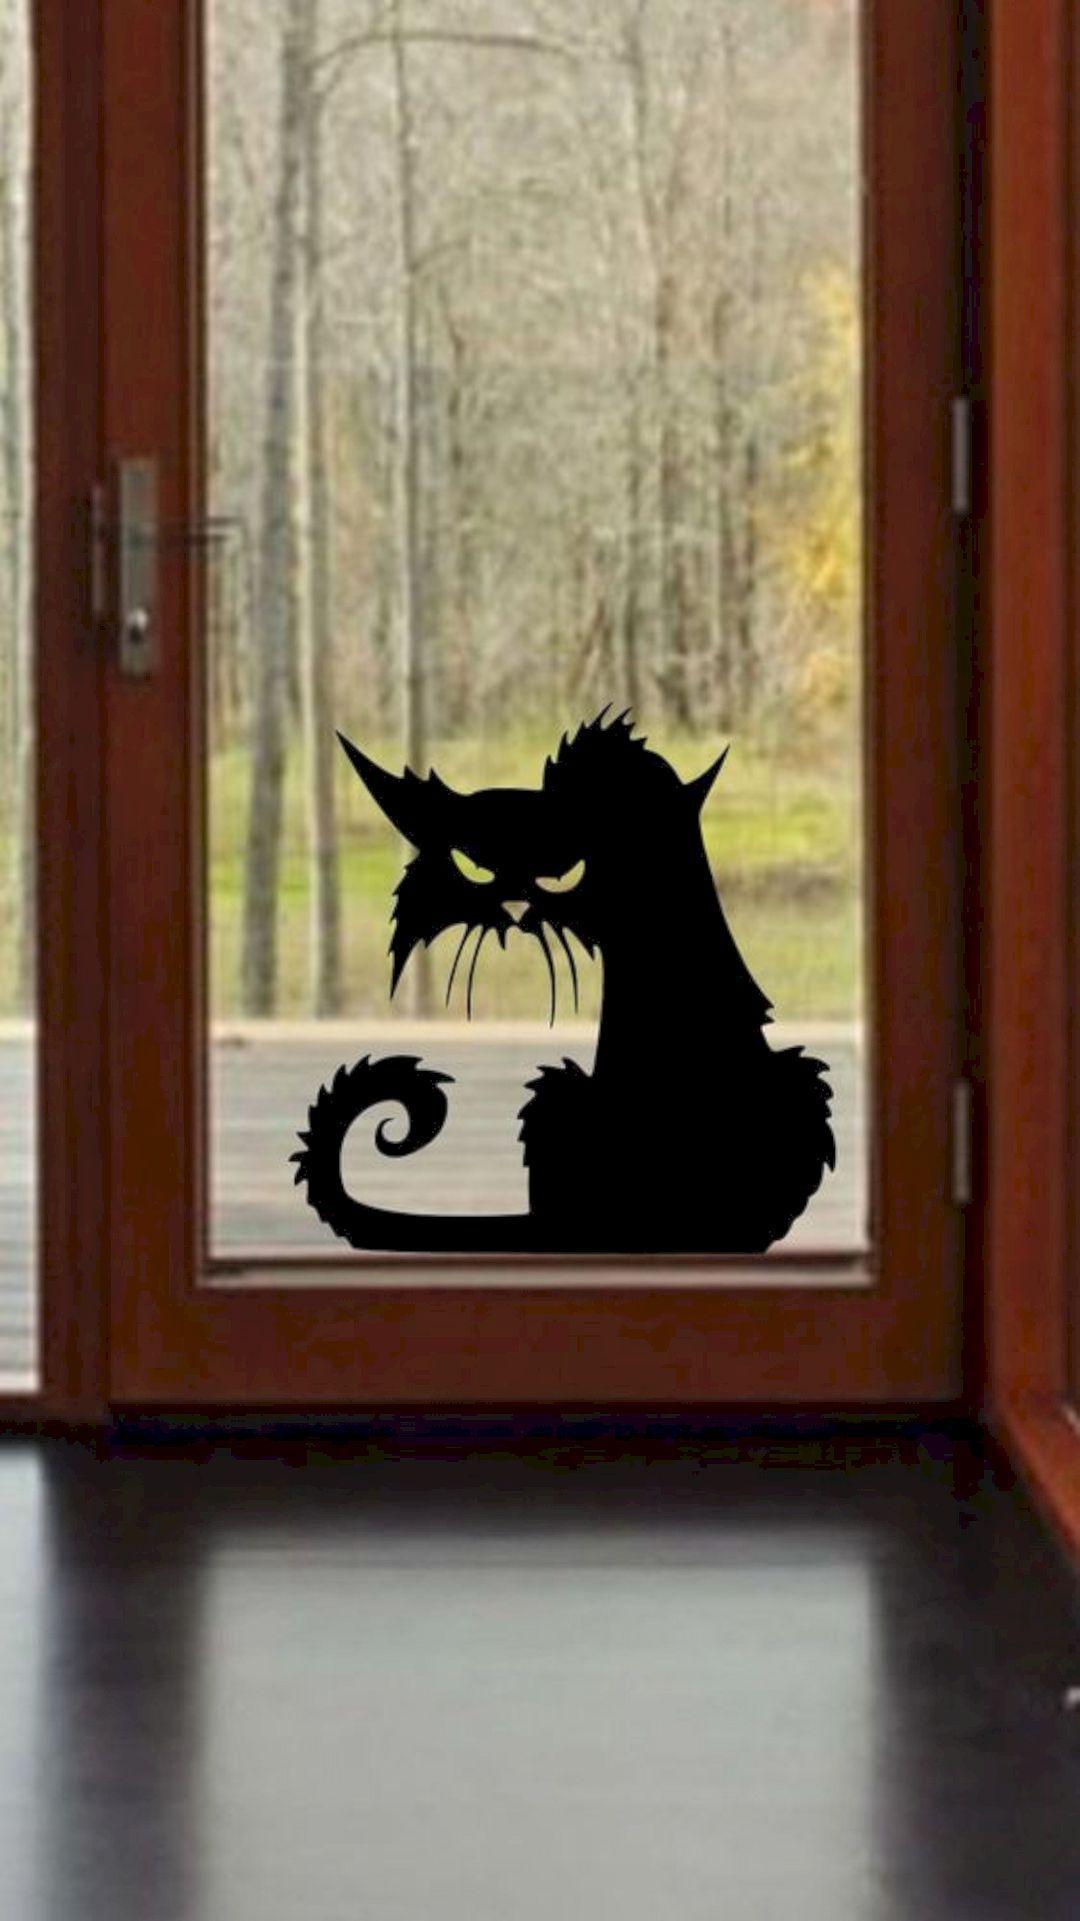 5 Best Dining Room Decorating Ideas Homemade Halloween Decorations Halloween Door Decorations Scary Cat